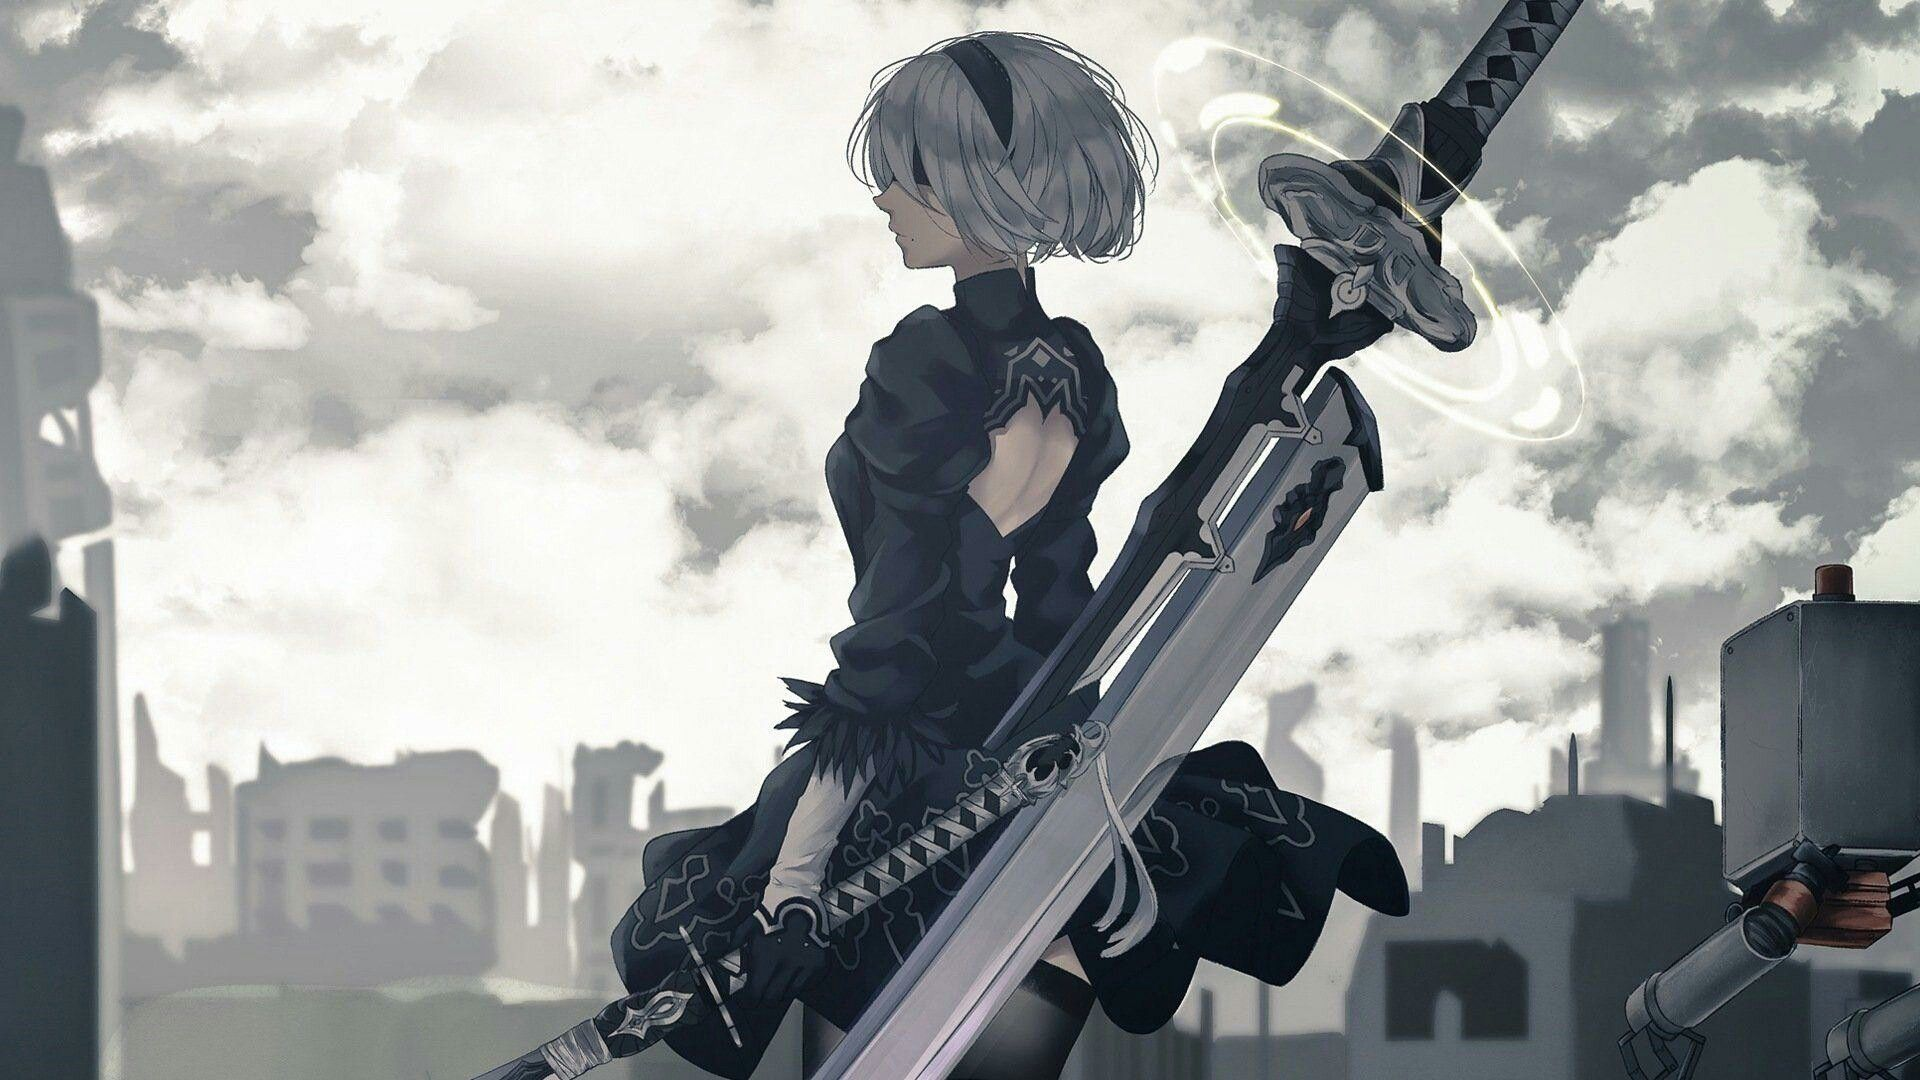 Nier By Shadow Mcshady Nier Automata Automata Anime Canvas